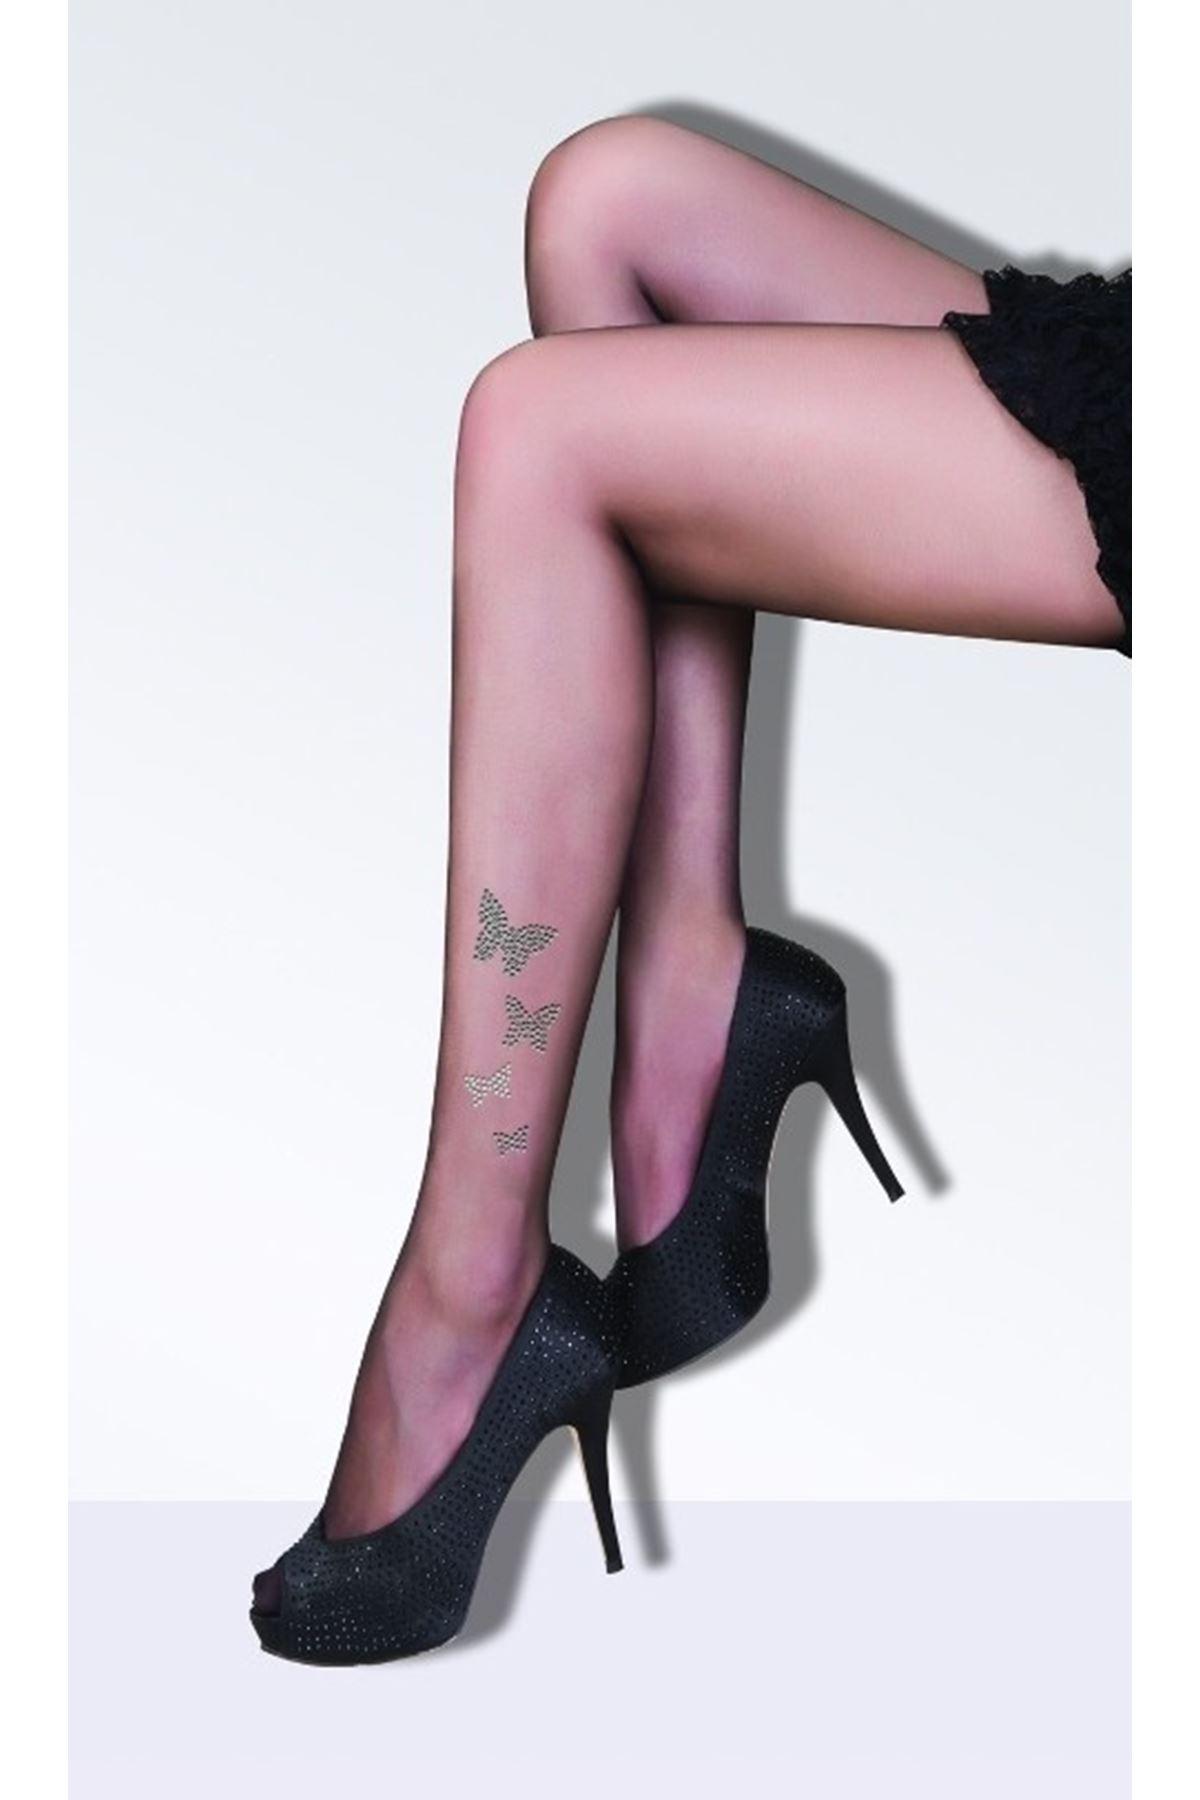 Daymod Butterfly Taşlı Külotlu Çorap Siyah